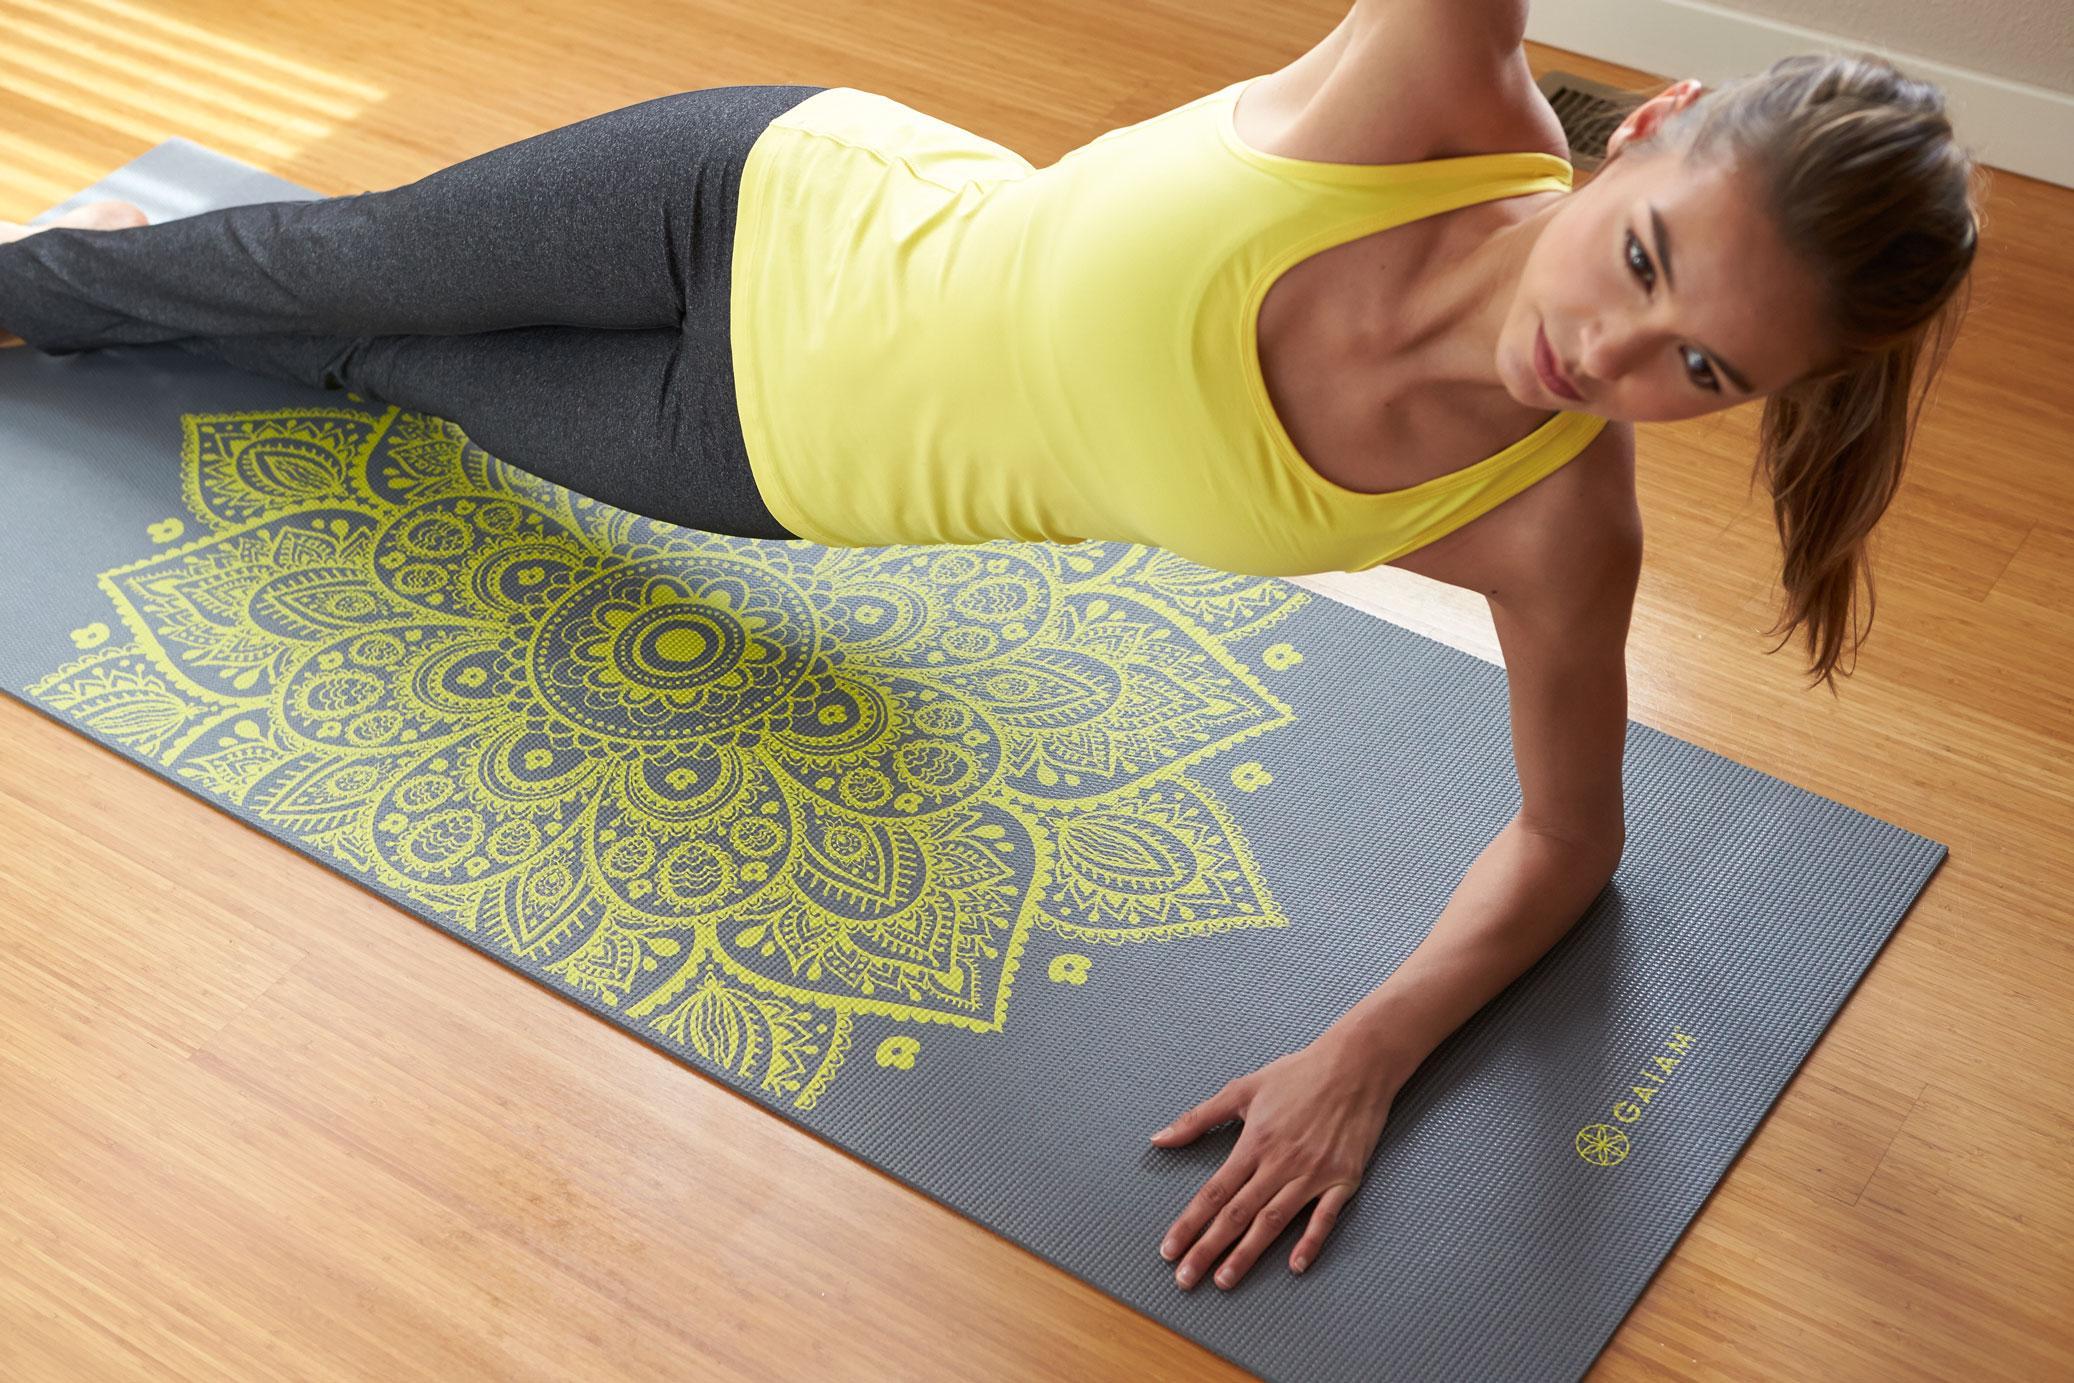 Amazon.com : Gaiam Ash Leaves Print Premium Yoga Mat (5mm